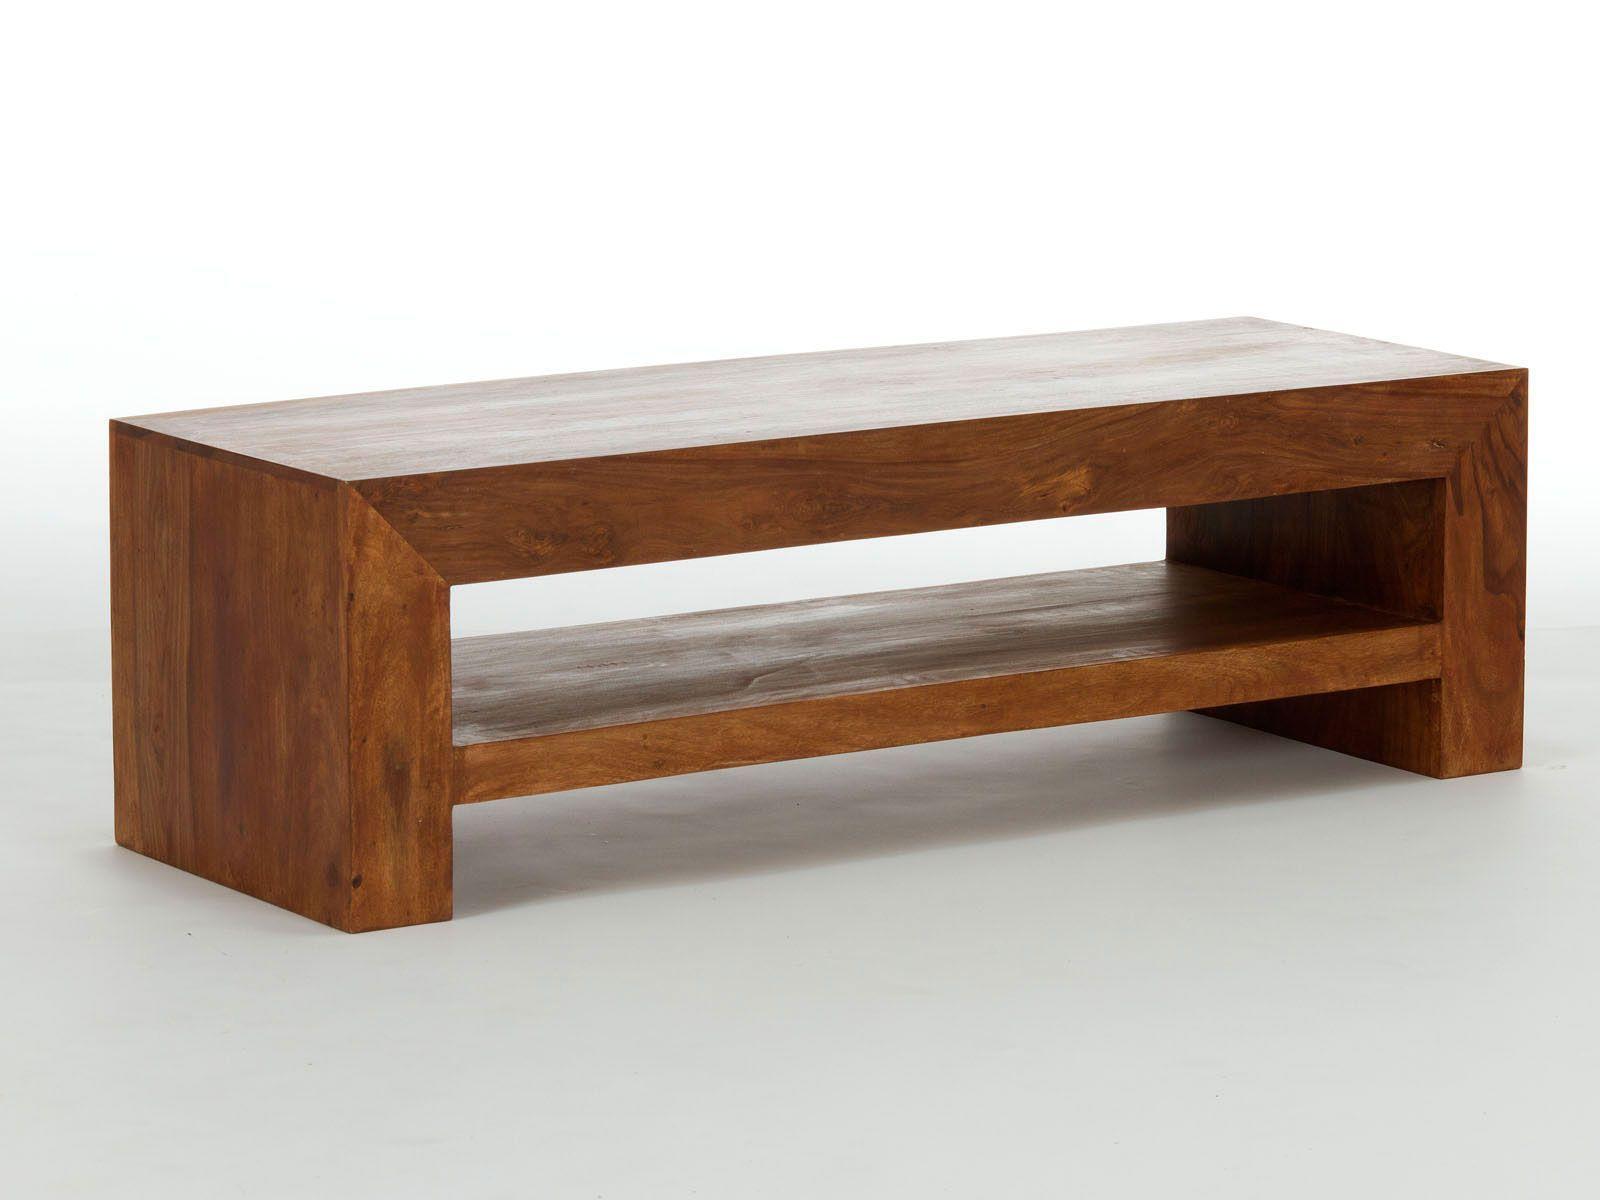 Table Tele En Simple En Palissandre - Meuble Tv Cube Avec 1 Compartiment En Palissandre Miel Meuble Tv [mjhdah]https://img1.dlmcdn.fr/a/3581/MSA3581039-0403-2250-p01-meuble-tele-palissandre-metric.jpg